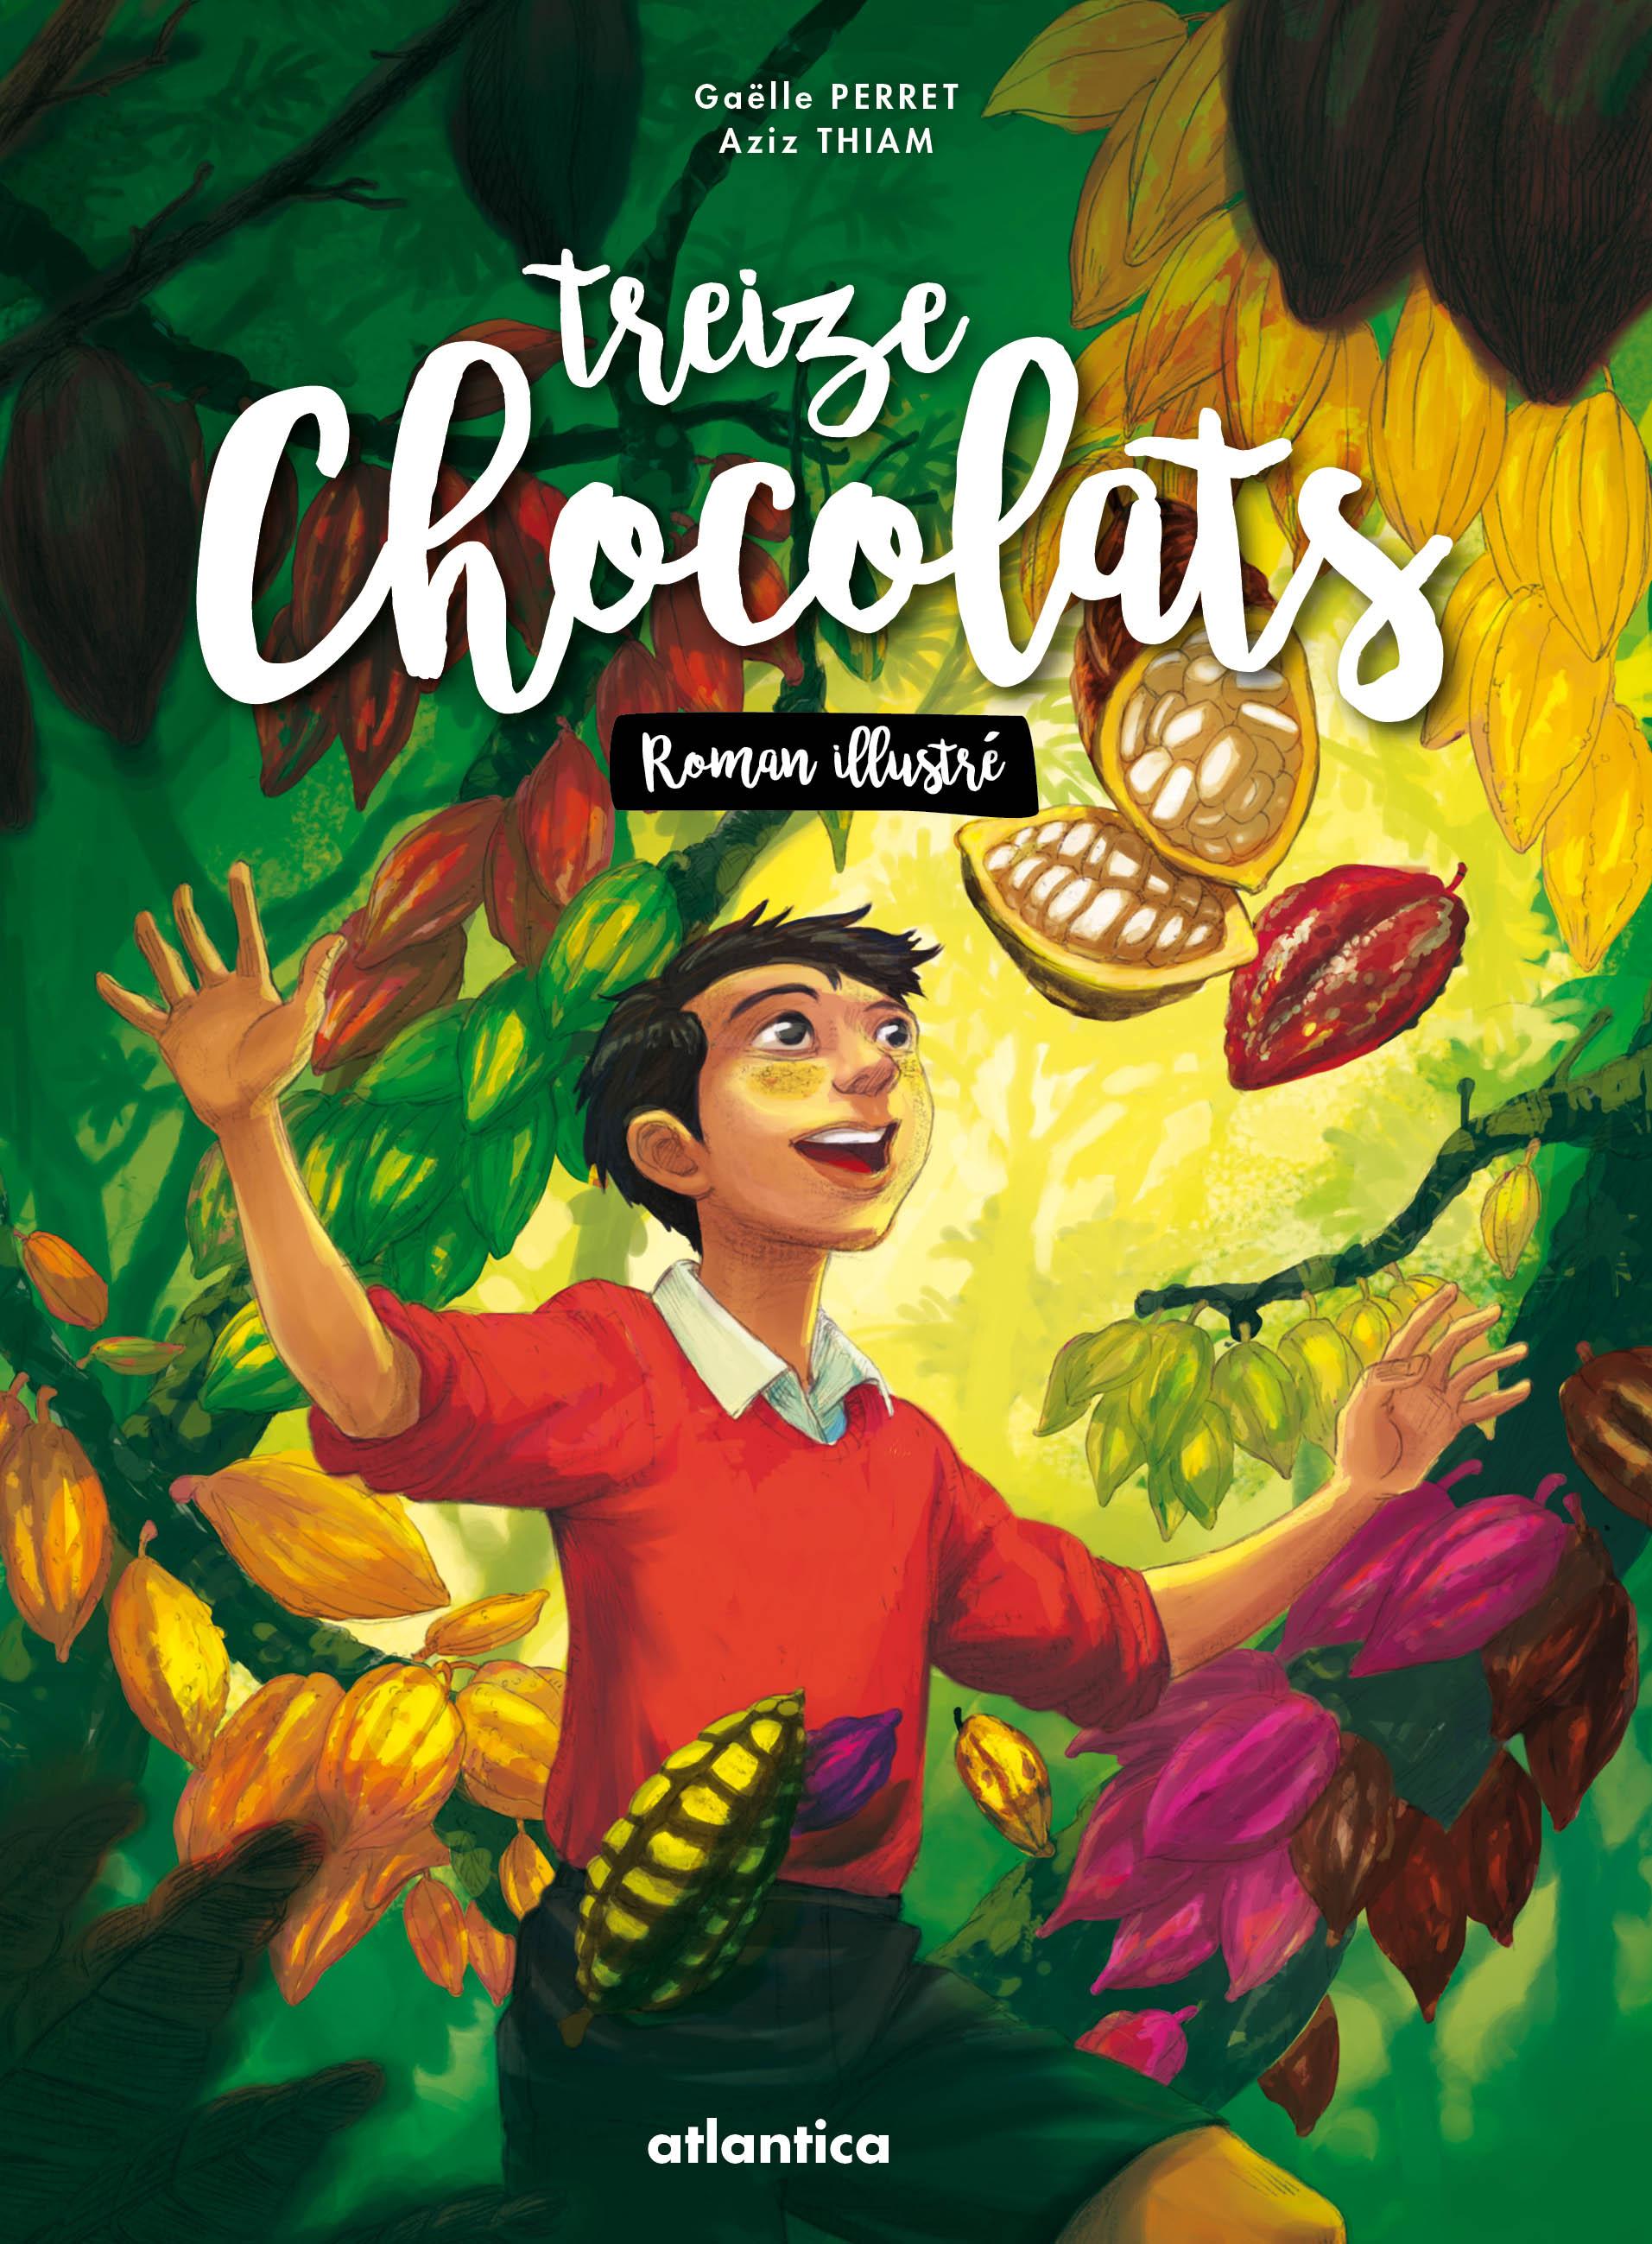 Exposition: Treize chocolats - ARTHEZ-DE-BEARN